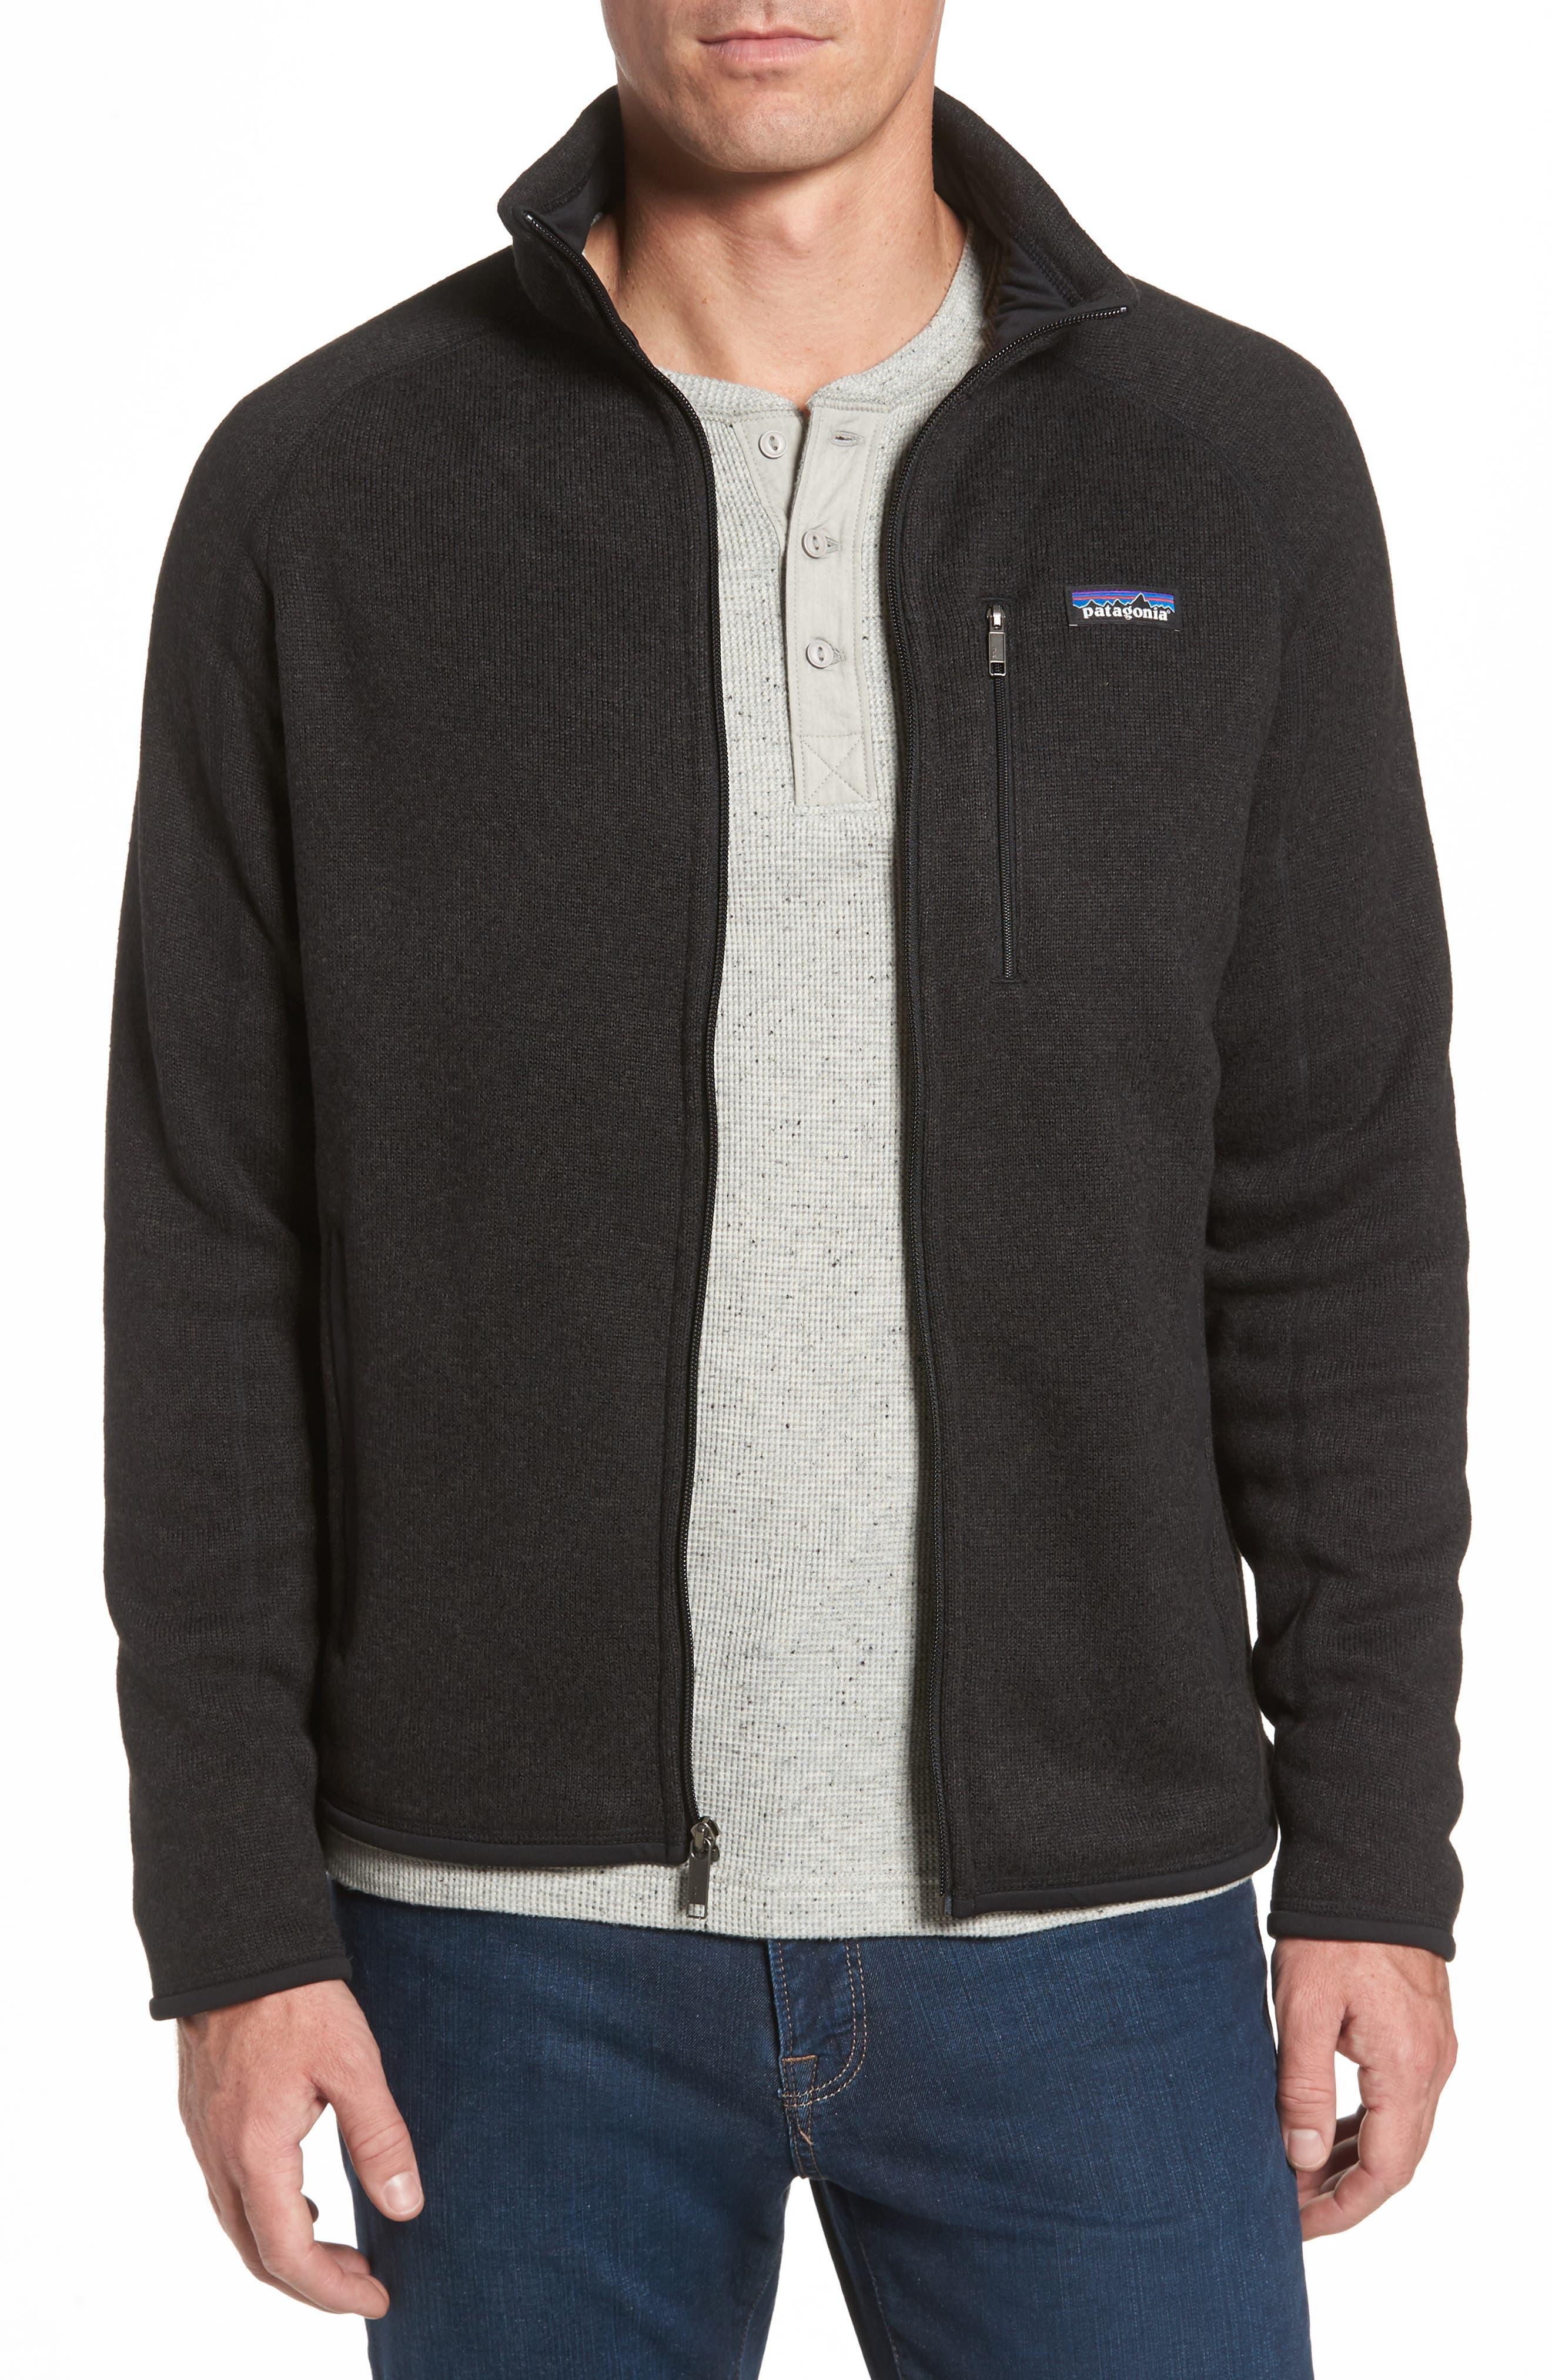 Patagonia down sweater men's medium